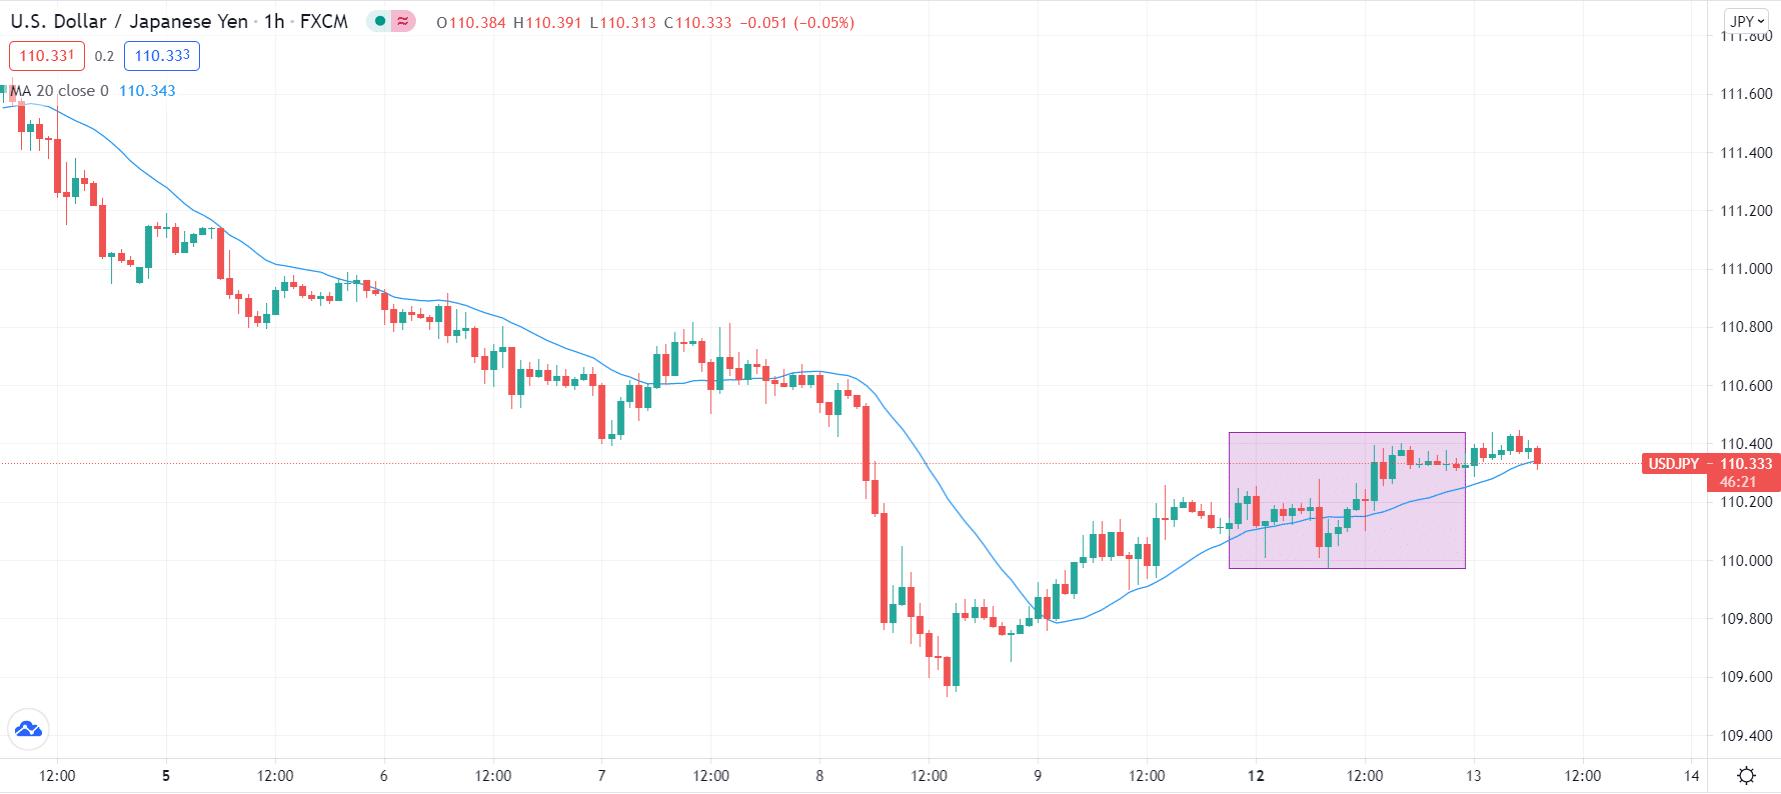 Tight range of USD/JPY